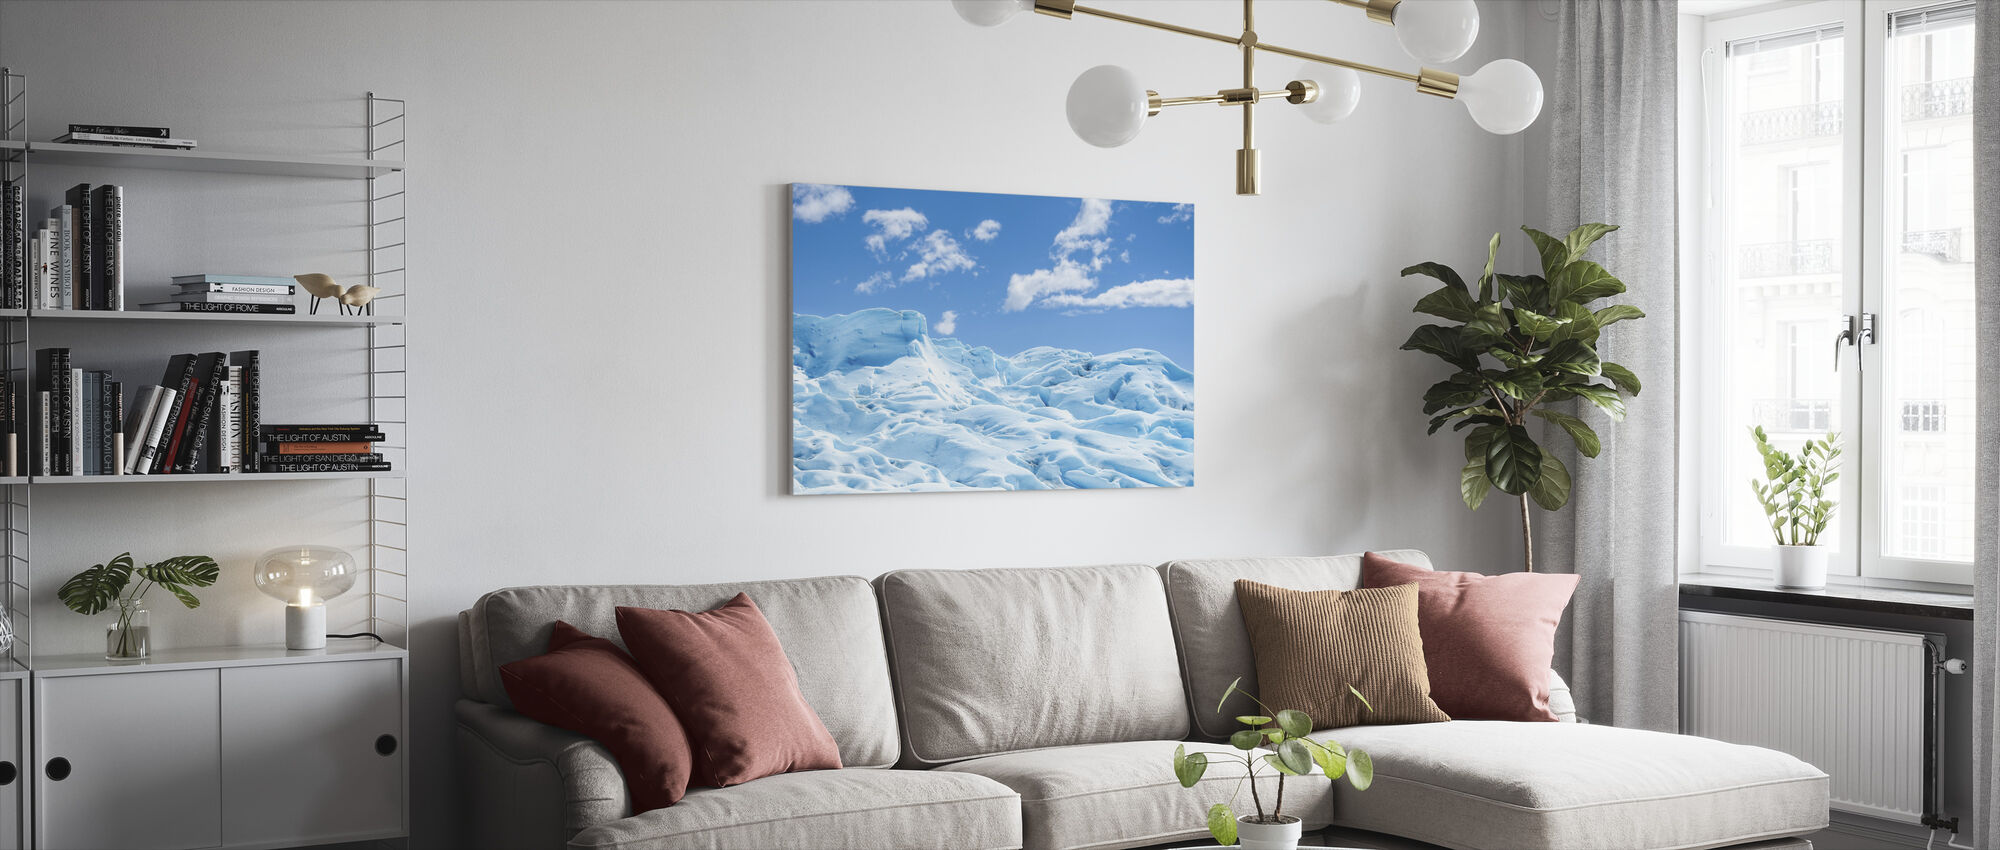 Bevroren grond - Canvas print - Woonkamer